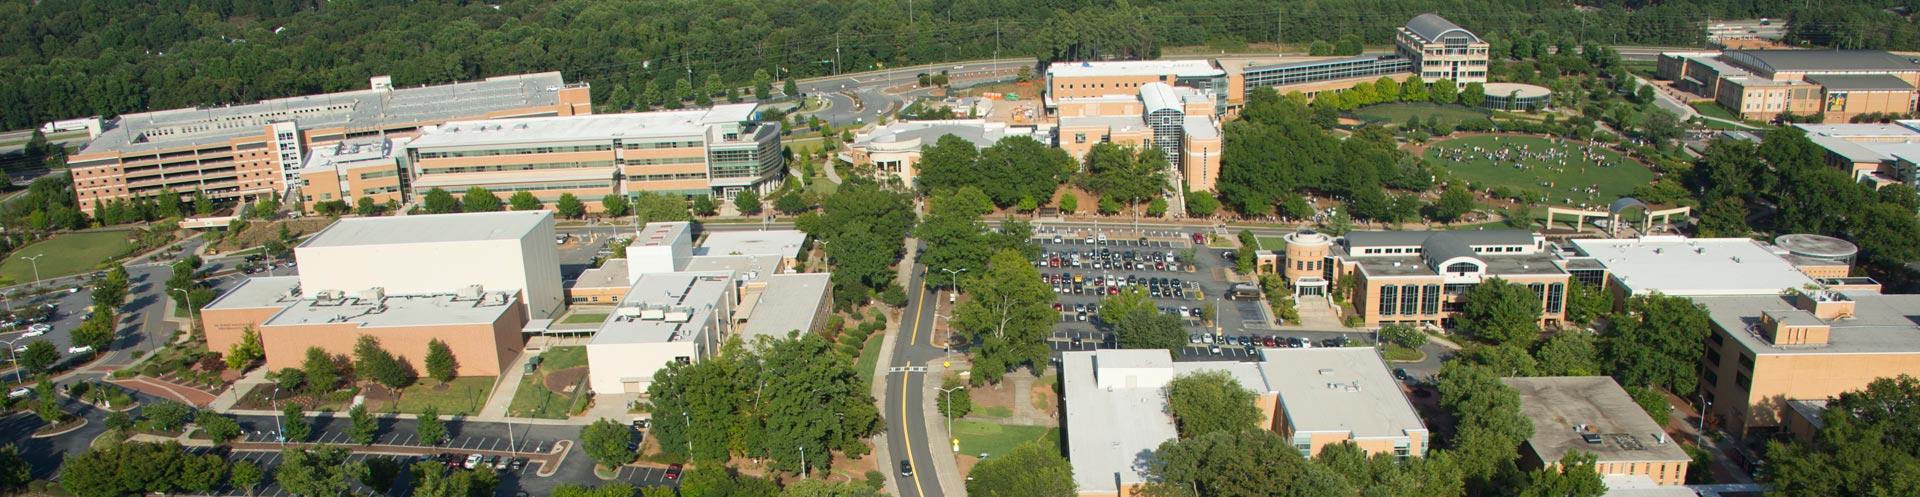 Kennesaw Campus